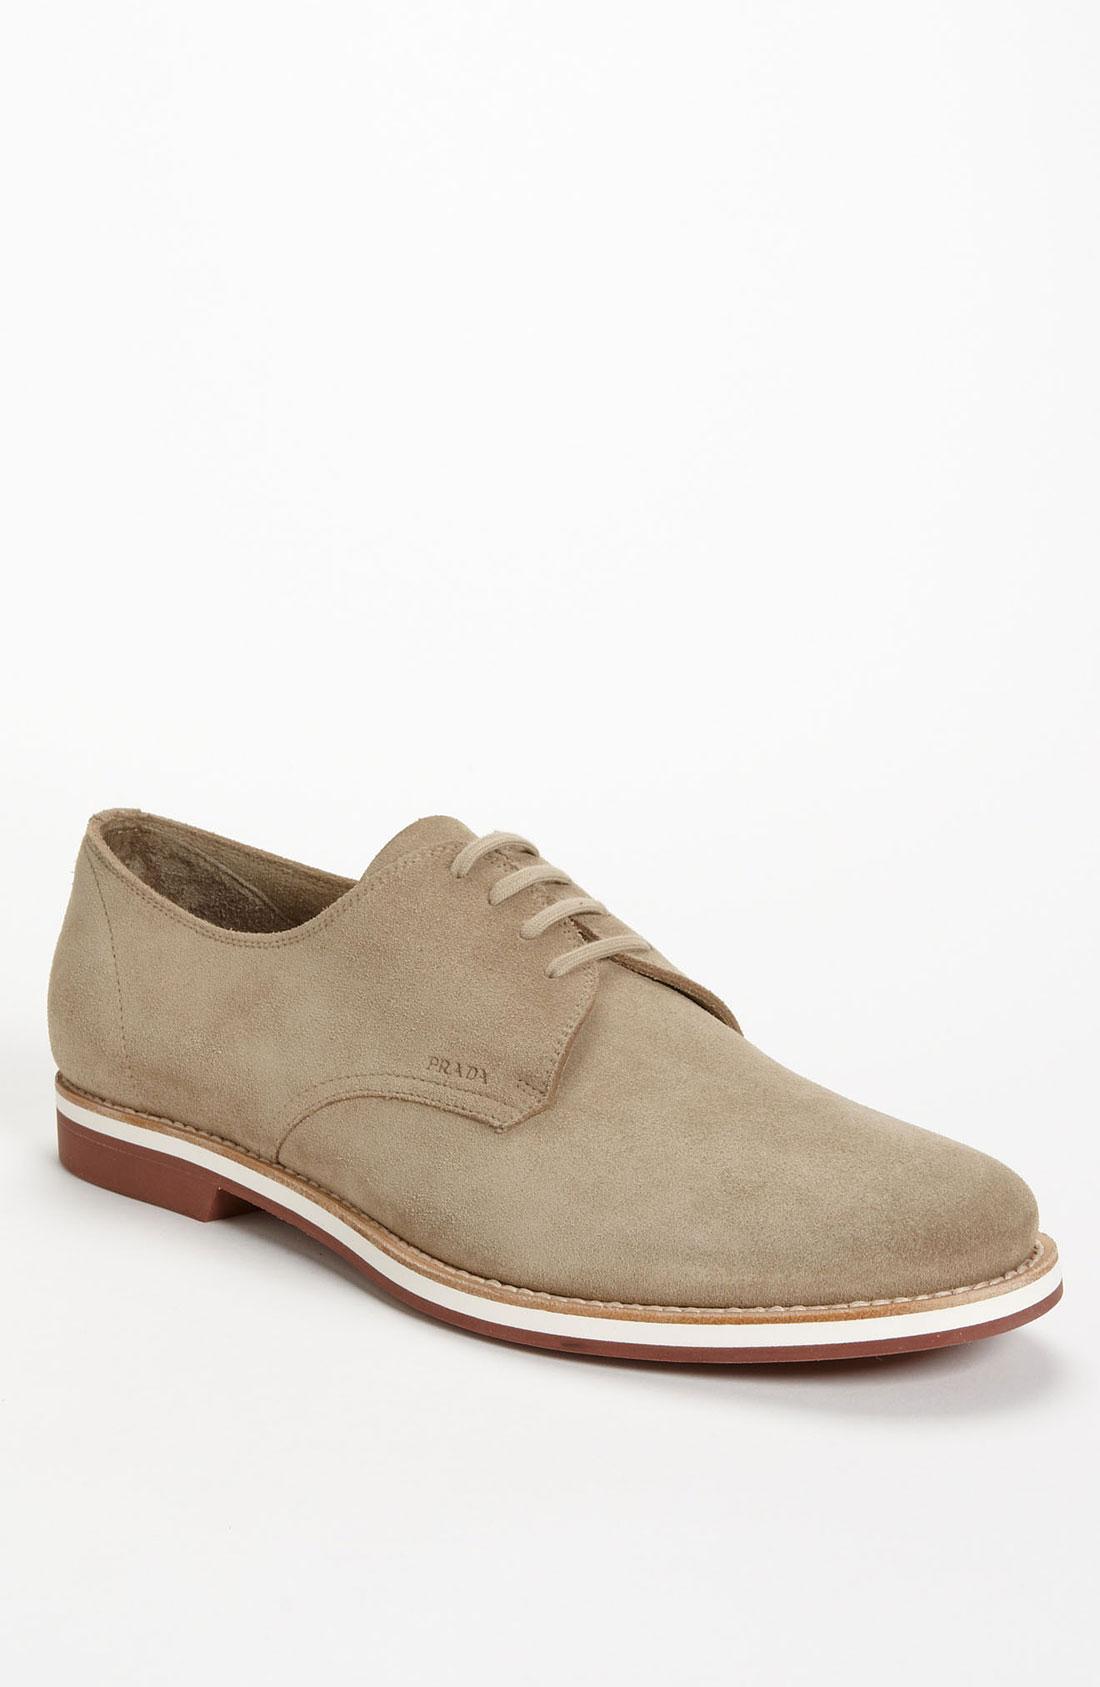 prada suede buck shoe in beige for desert lyst